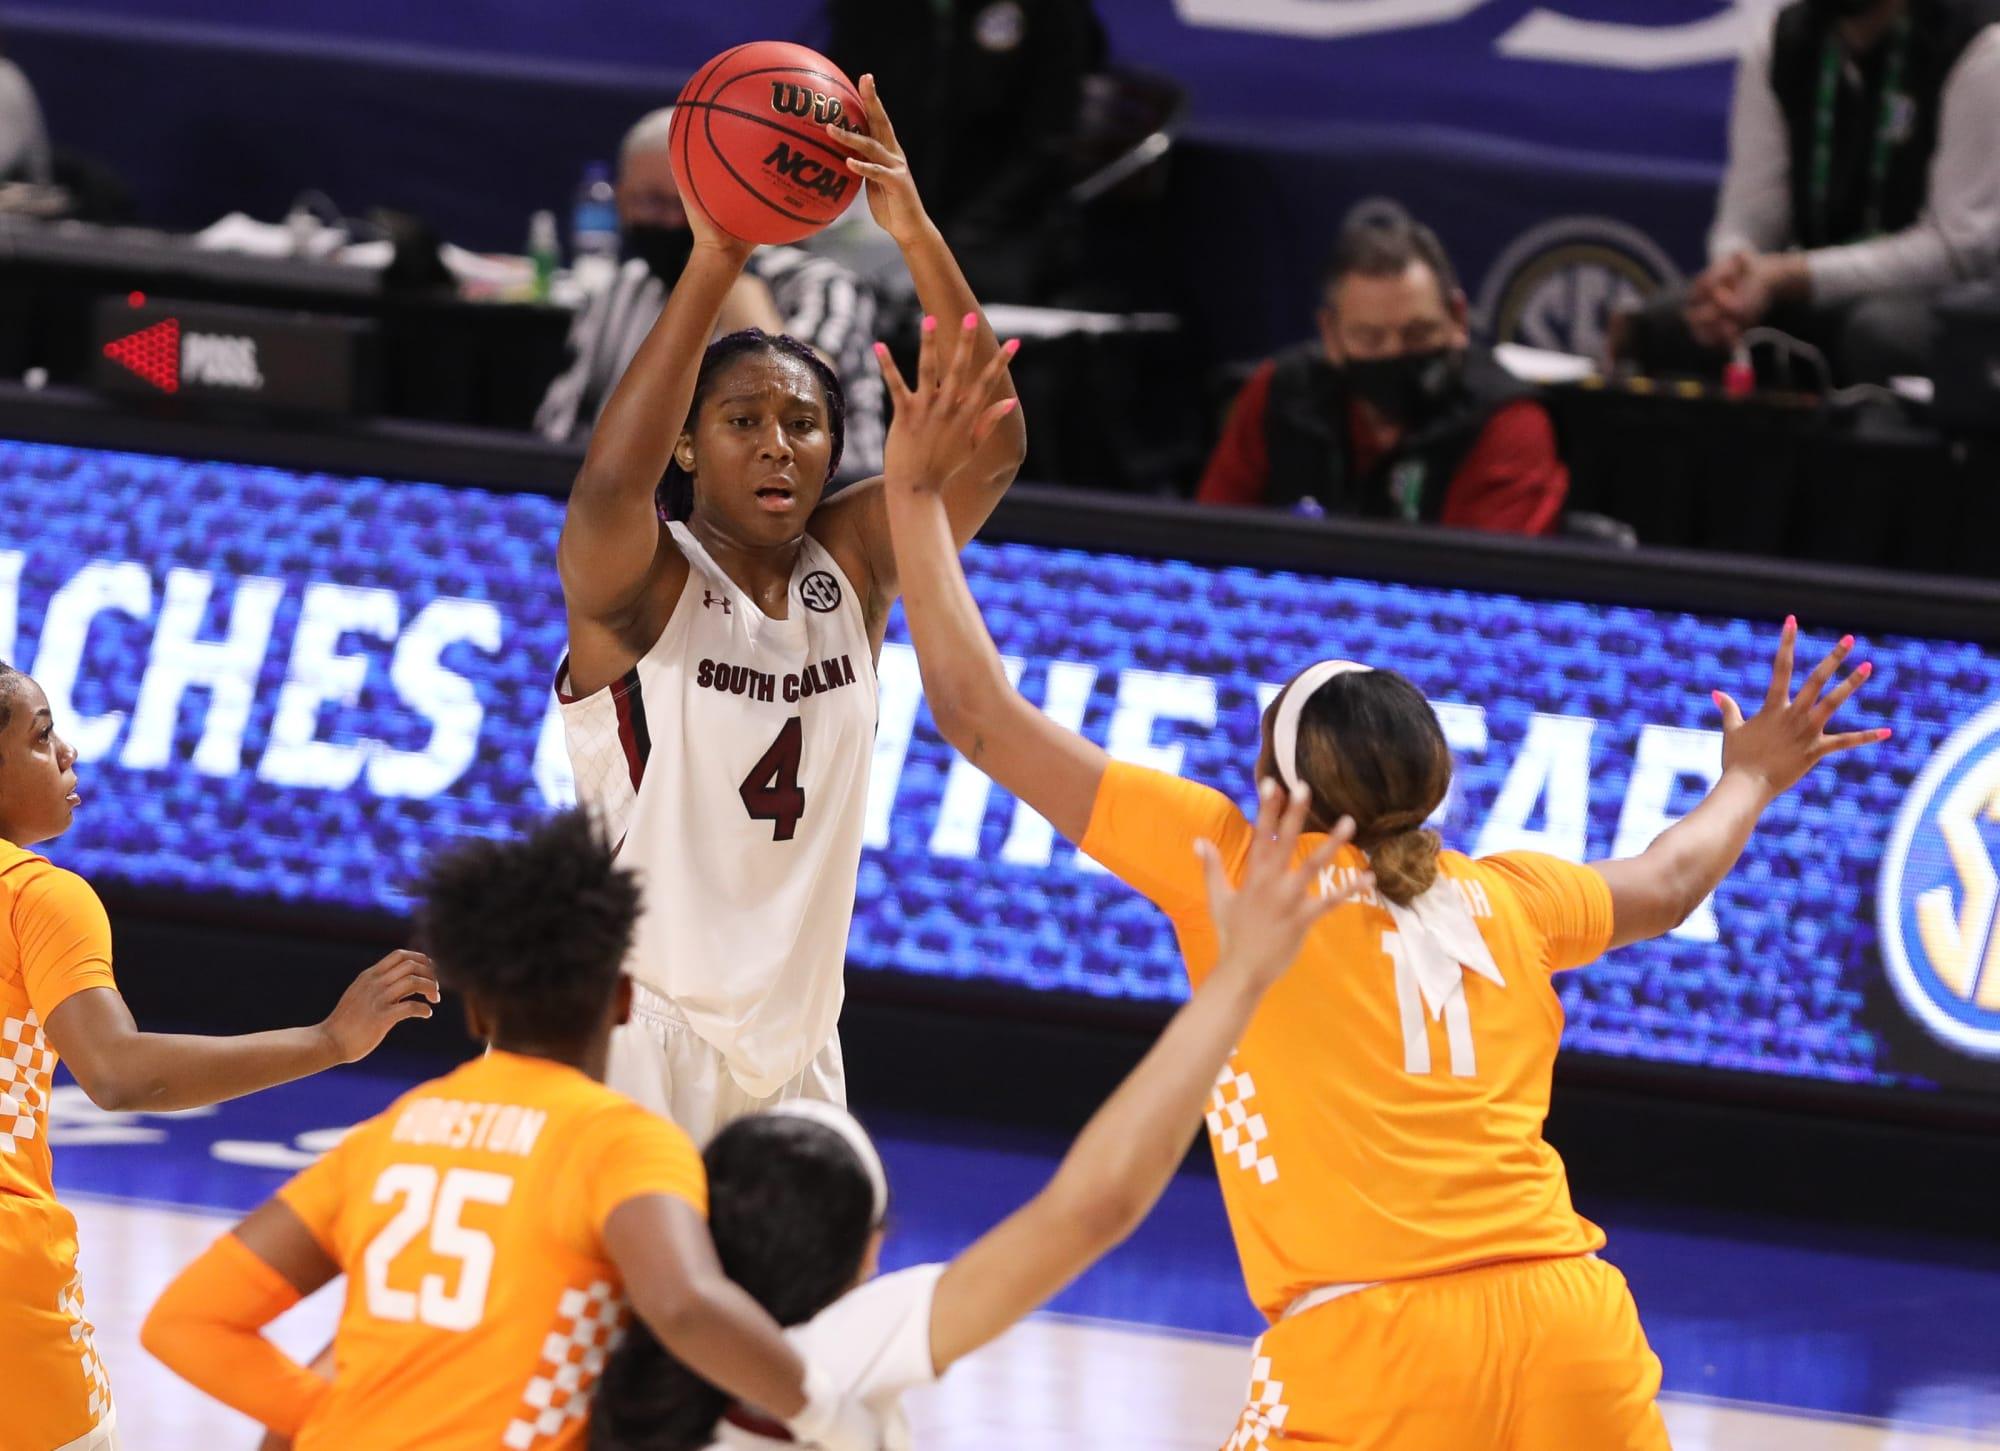 SEC Tournament: Three takeaways from Lady Vols' loss to South Carolina